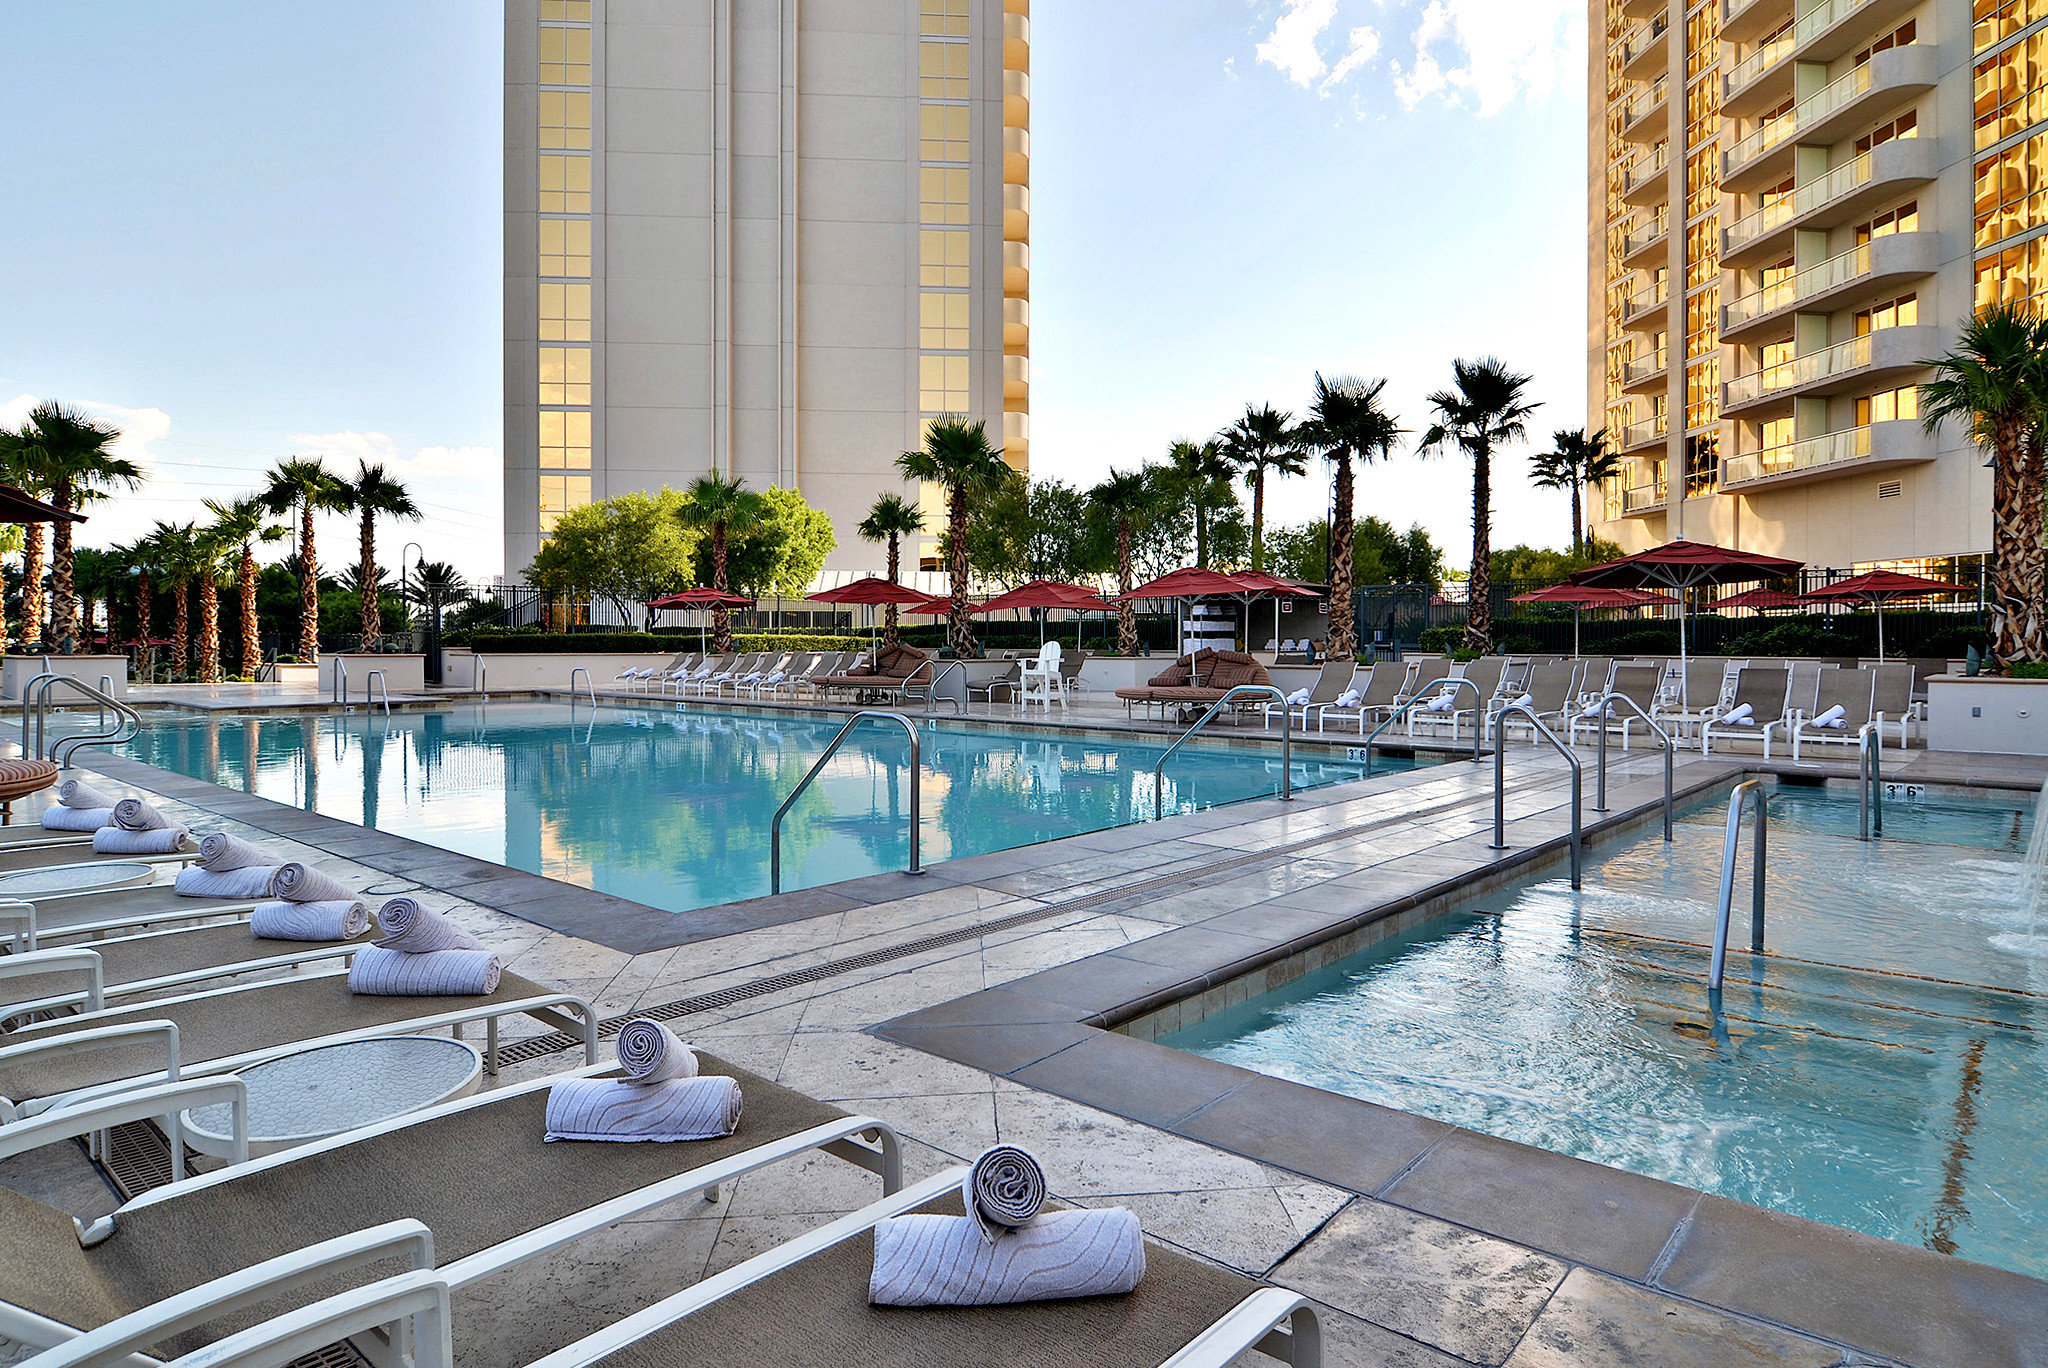 Hip Luxury Pool sky building swimming pool leisure condominium property Resort plaza reflecting pool marina resort town dock palace day colonnade